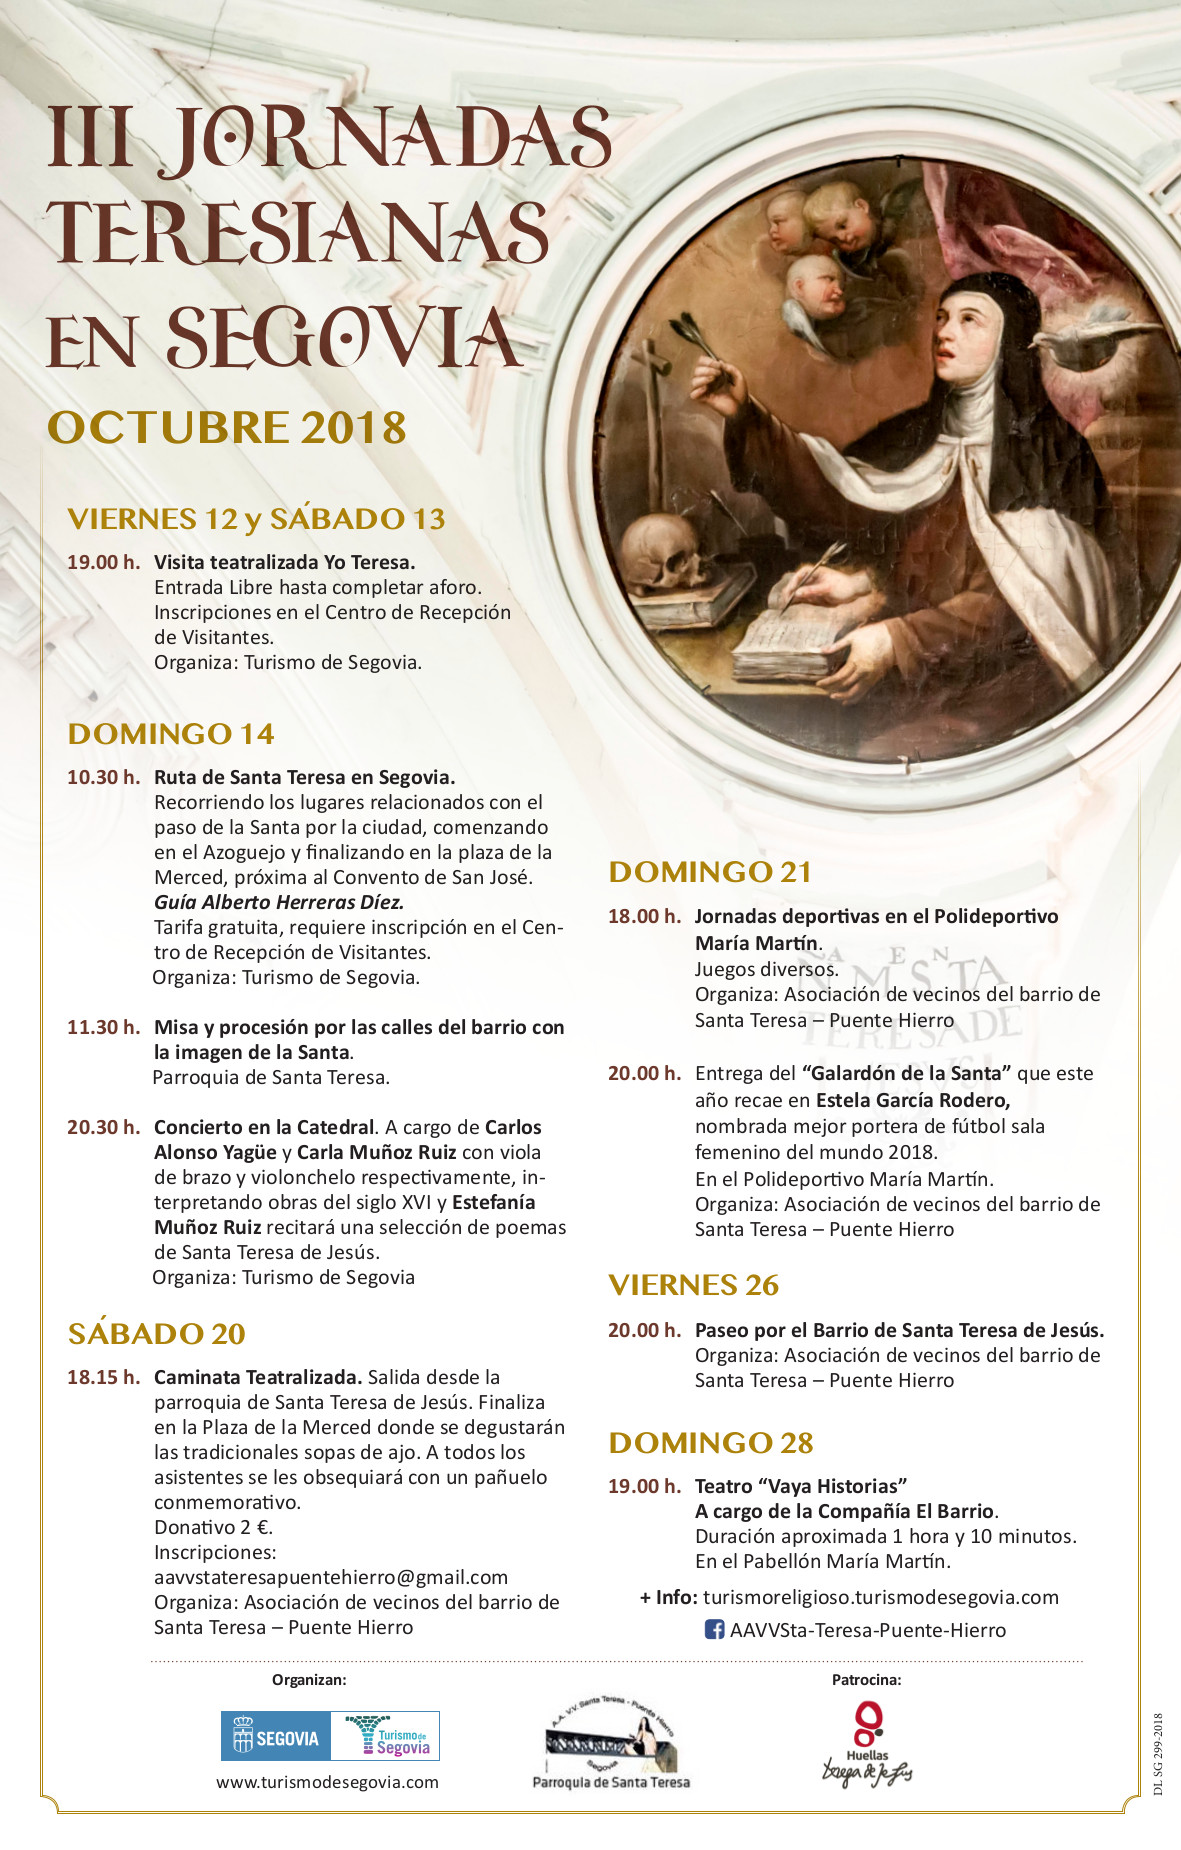 Jornadas Teresianas in Segovia